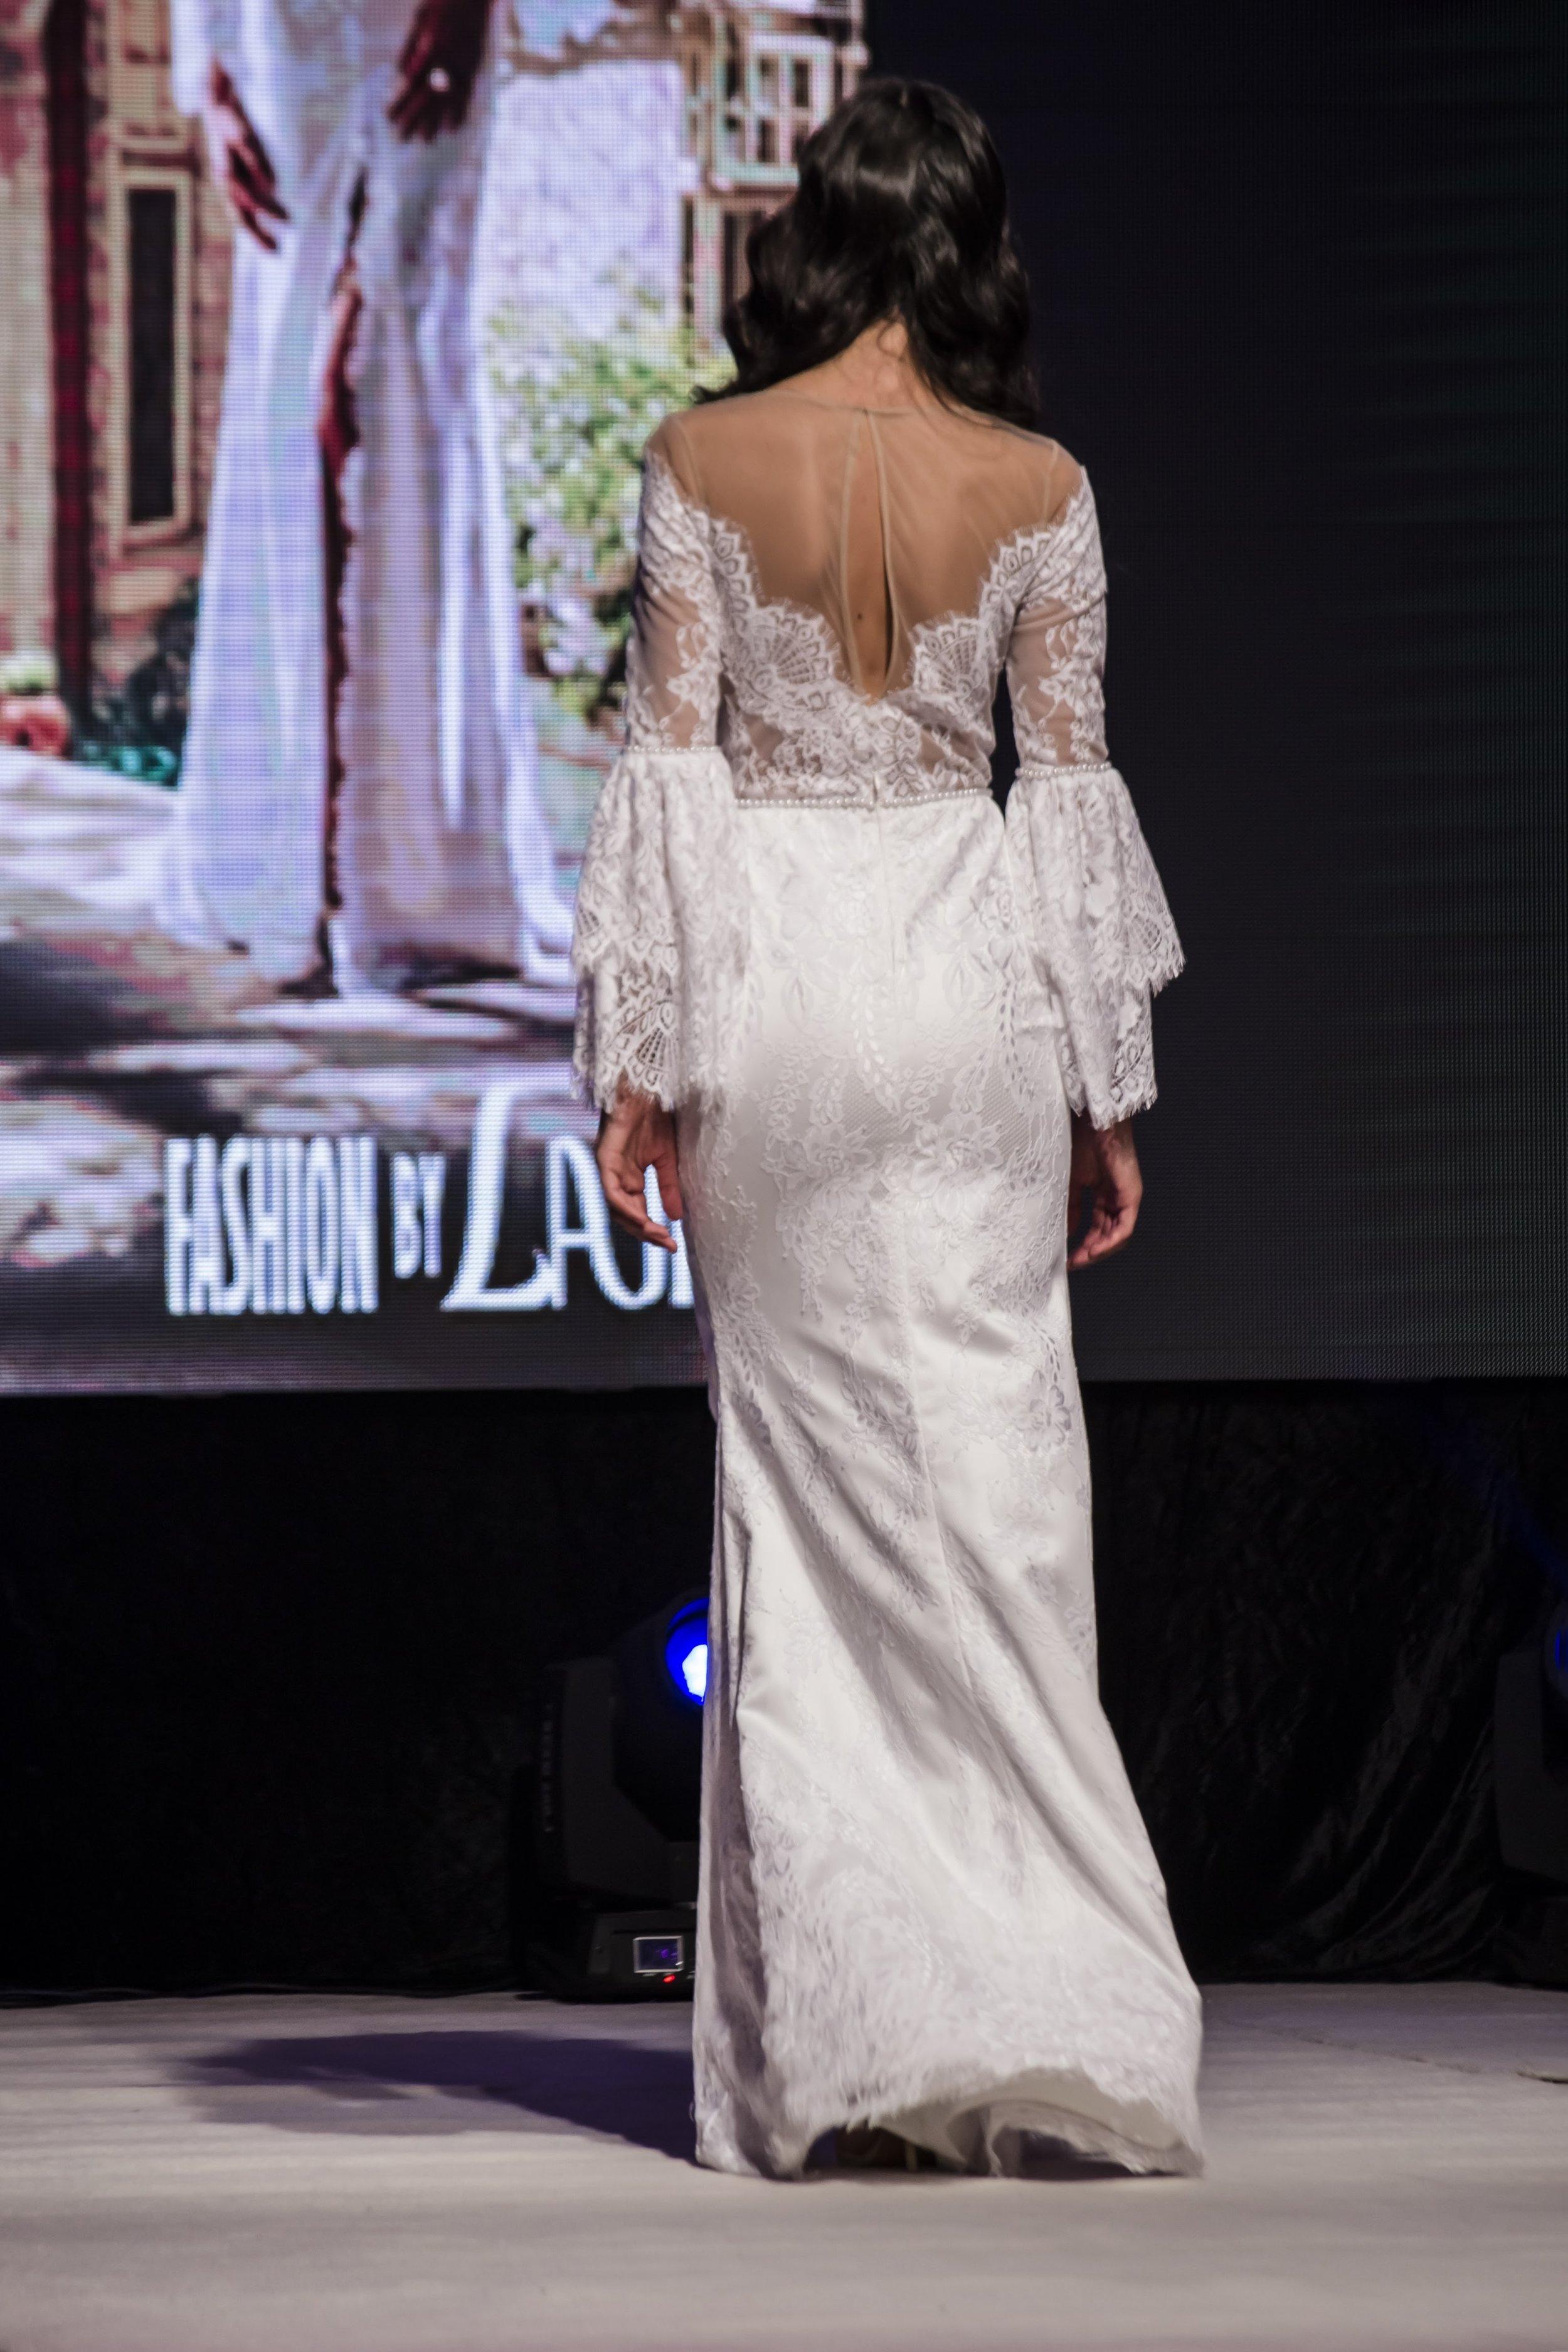 Muguet 2018 Wedding Dress - Fashion By Laina